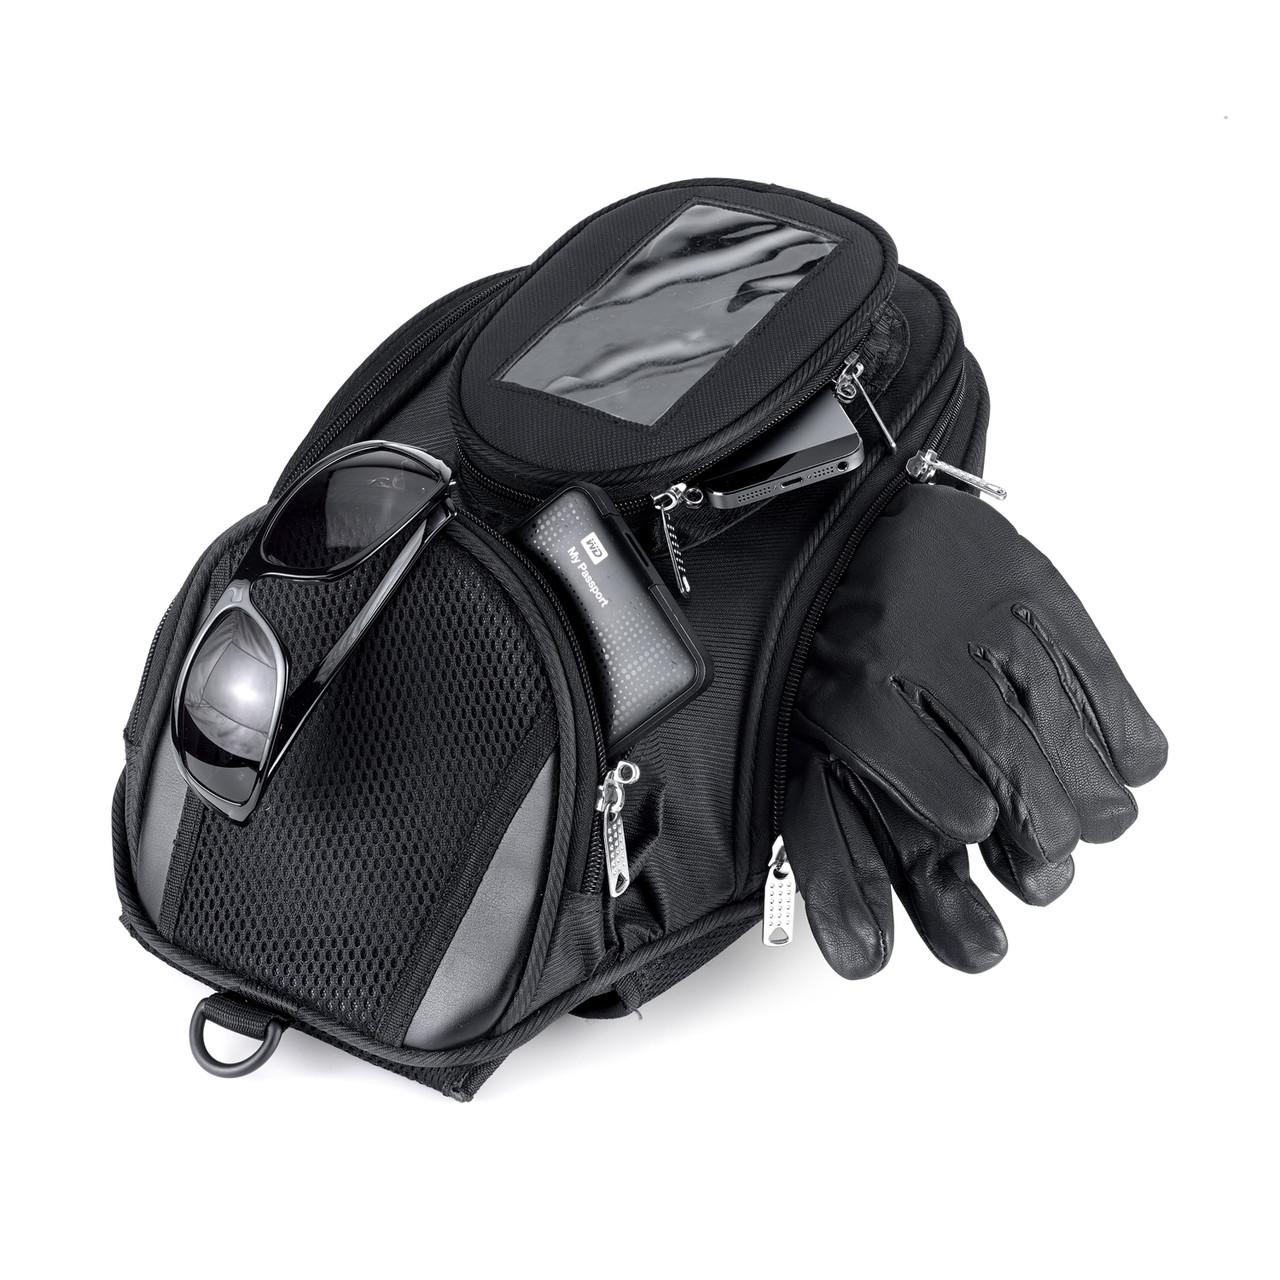 Viking Survival Series Motorcycle Tank Bag carrying Items